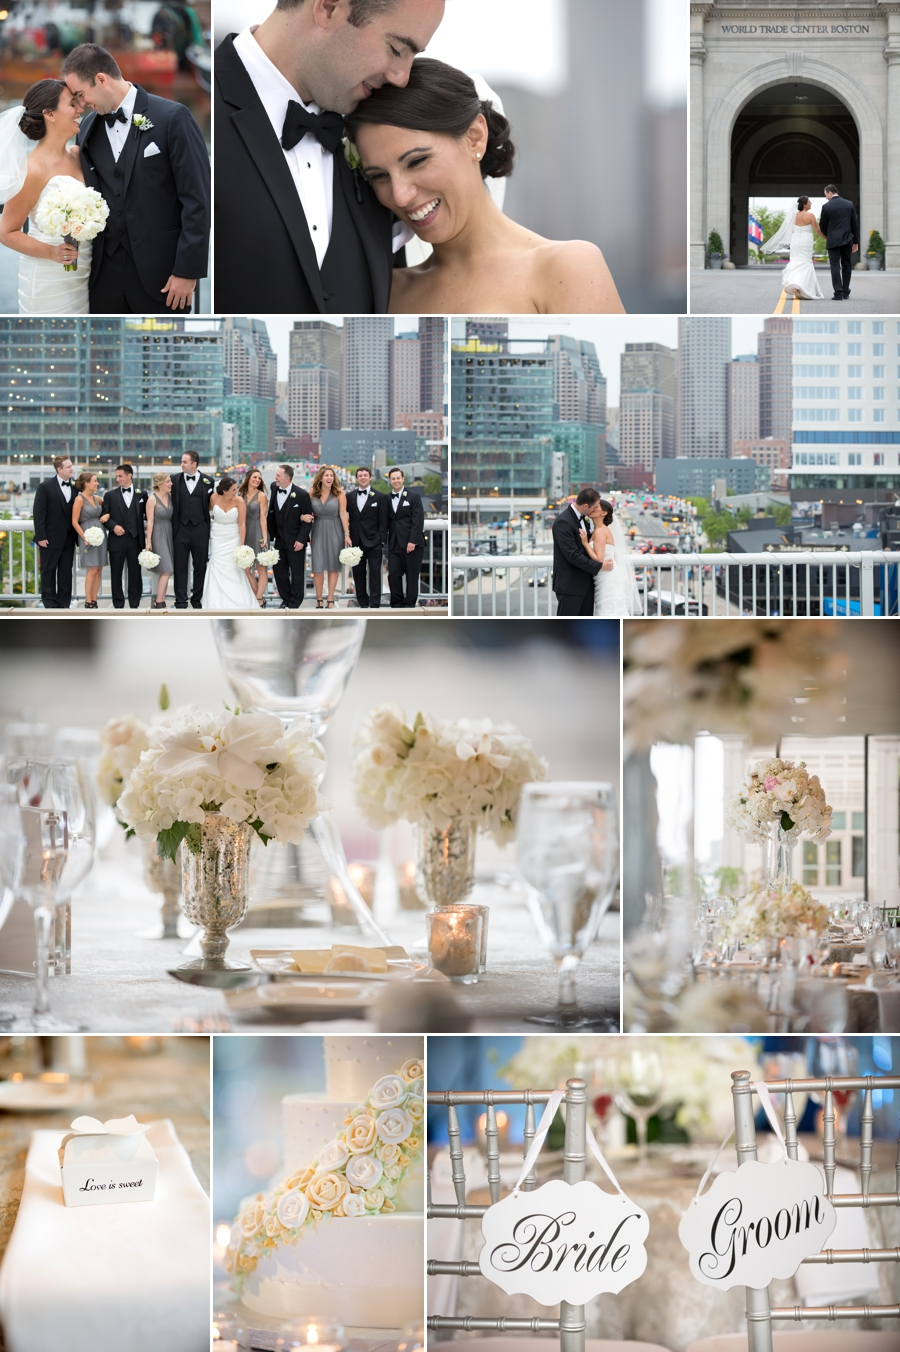 Seaport_Lighthouse_Wedding_Photos